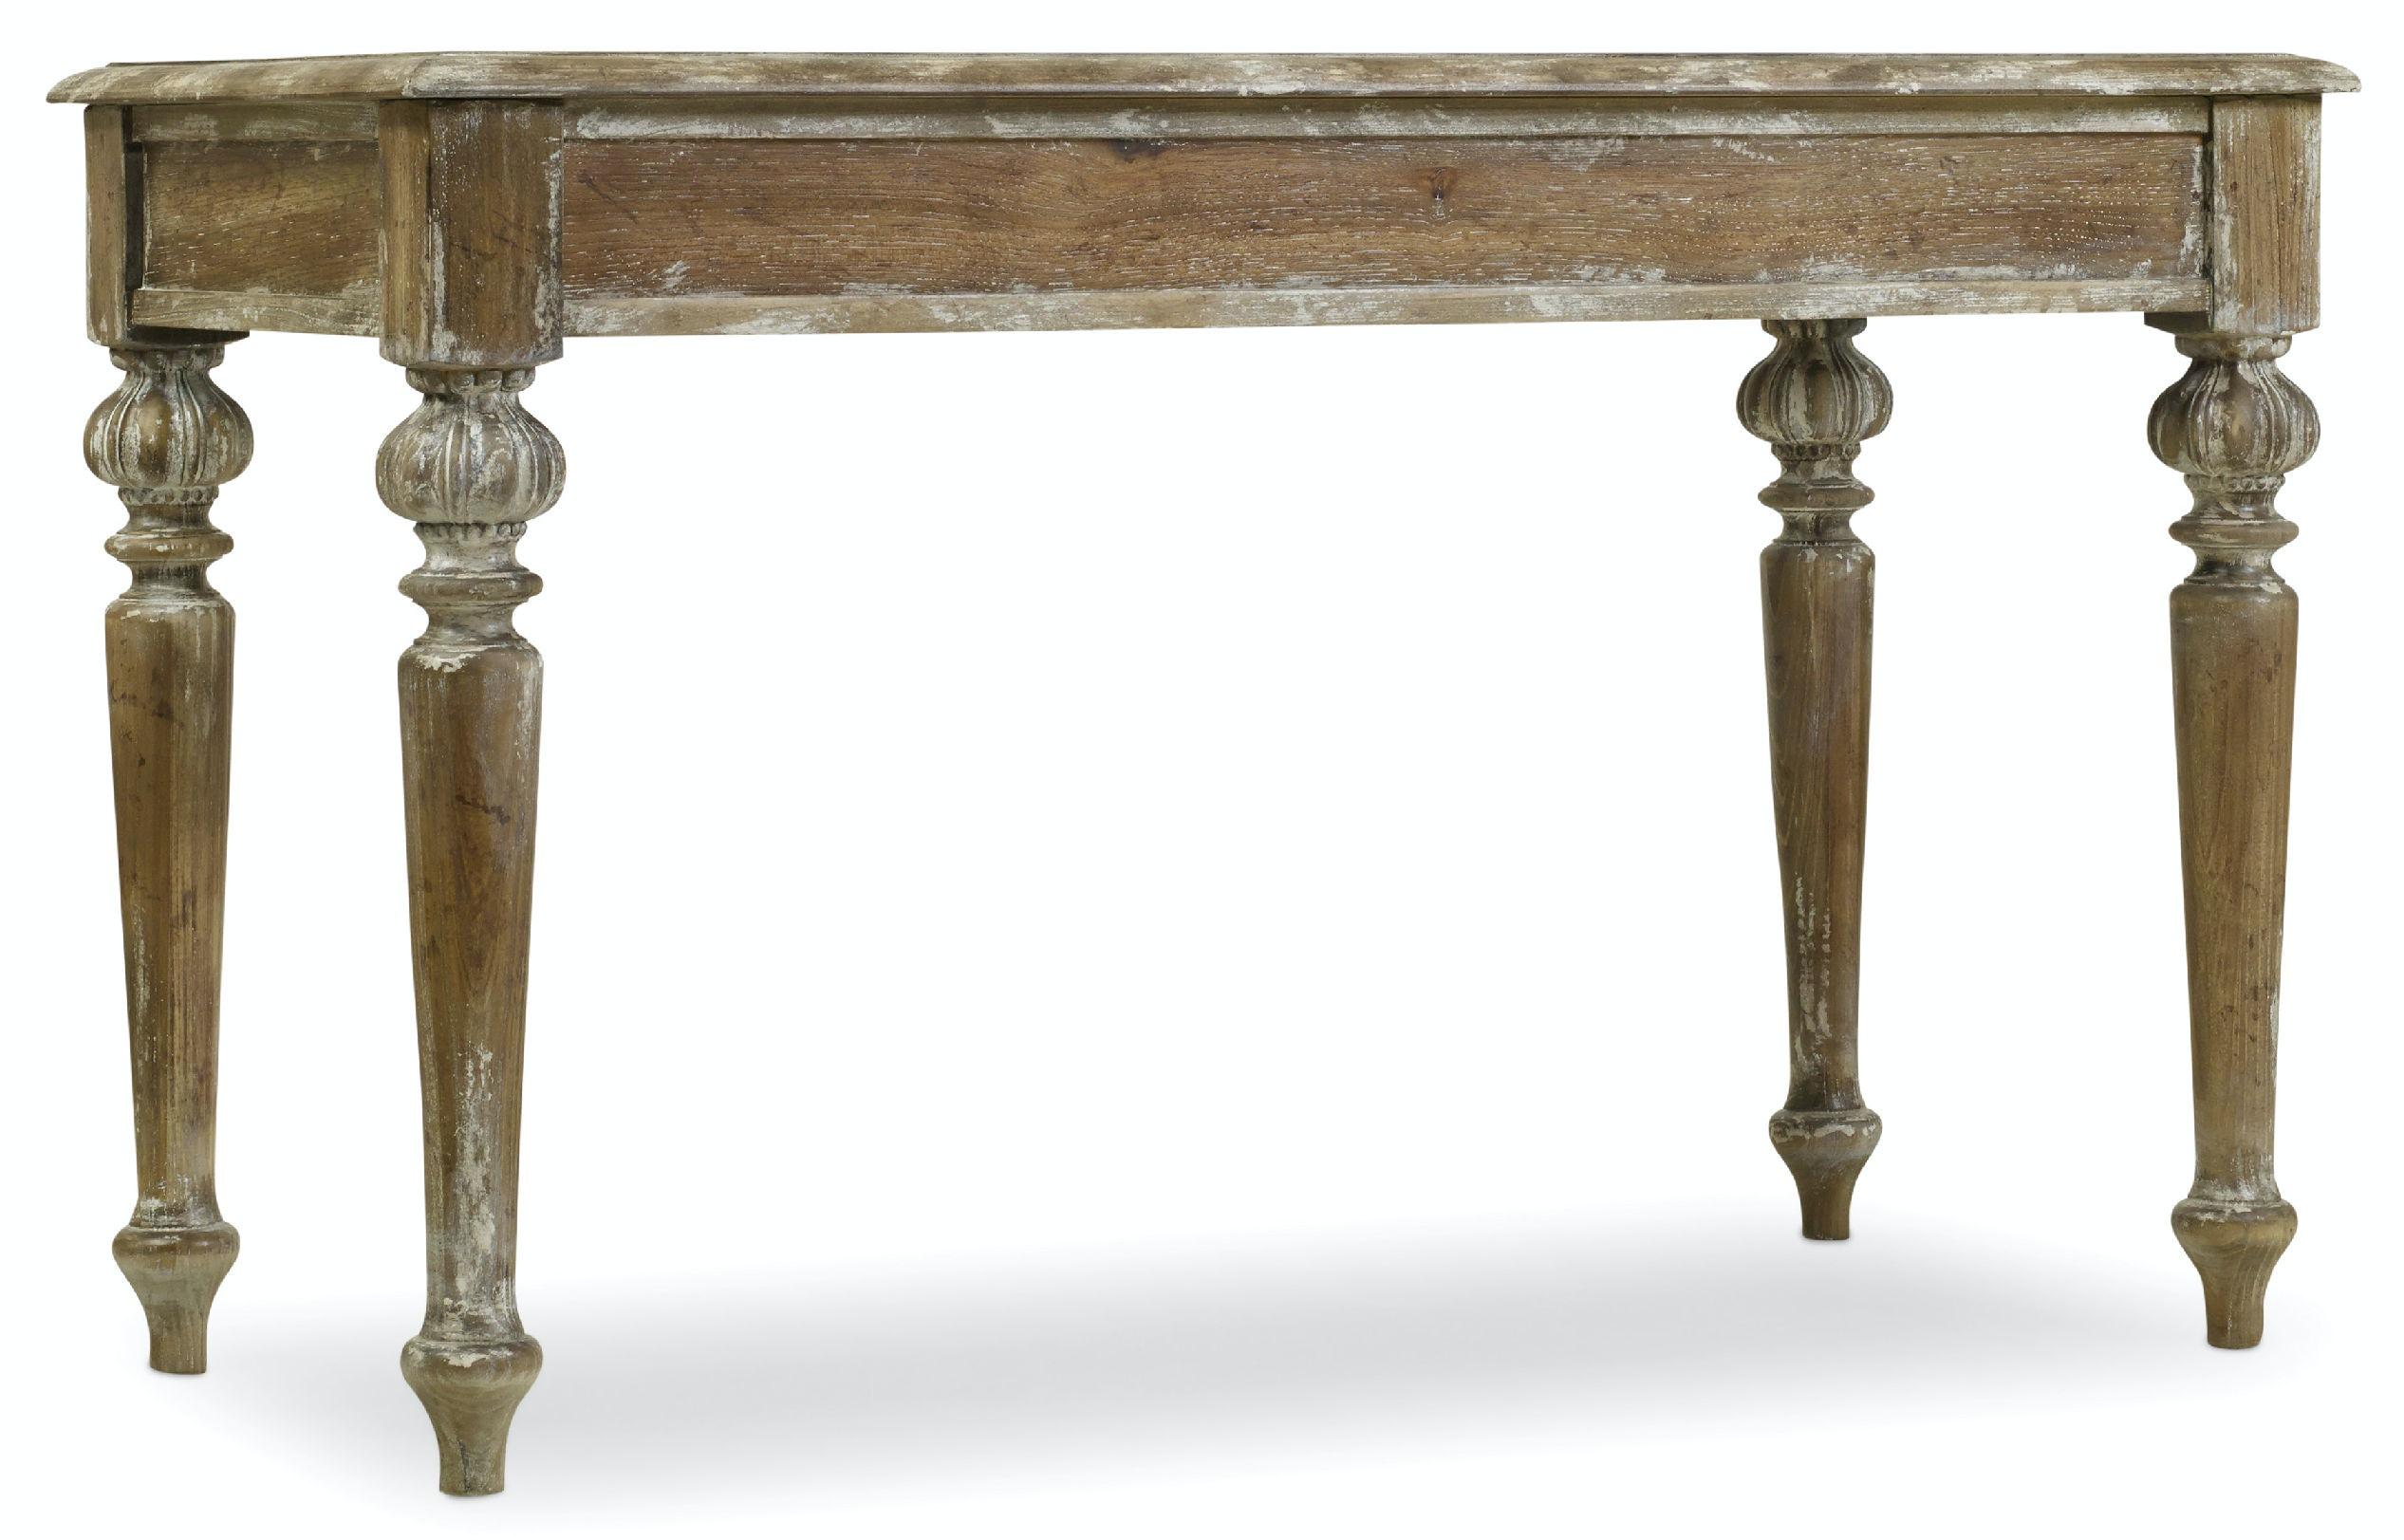 hooker furniture home office chatelet writing desk hs530010482 walter e smithe furniture design